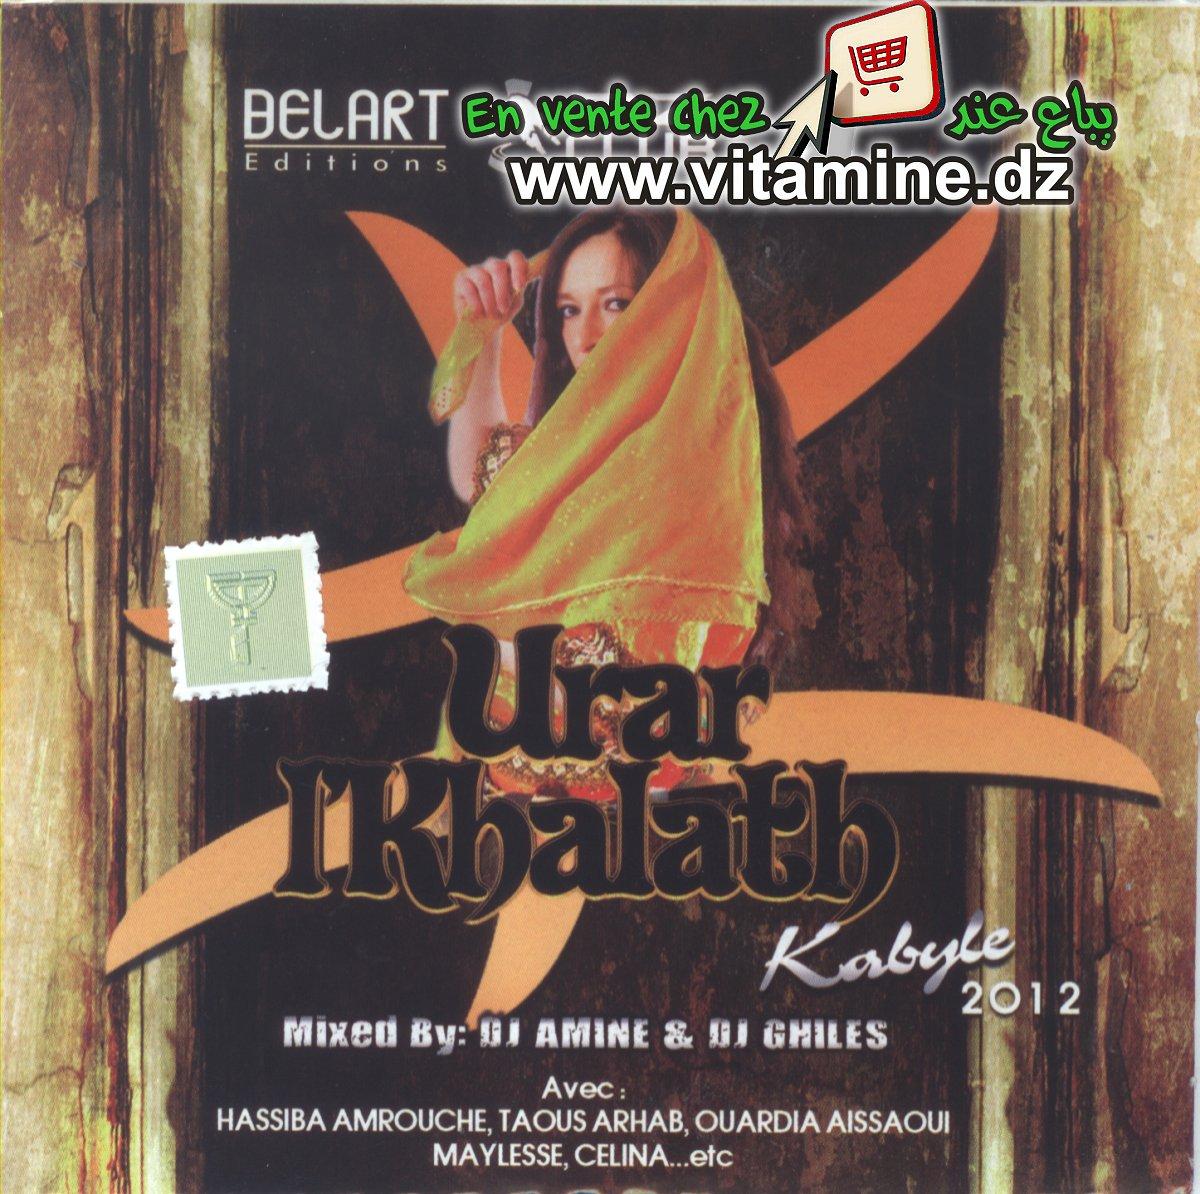 Urar l'khalath - compilation